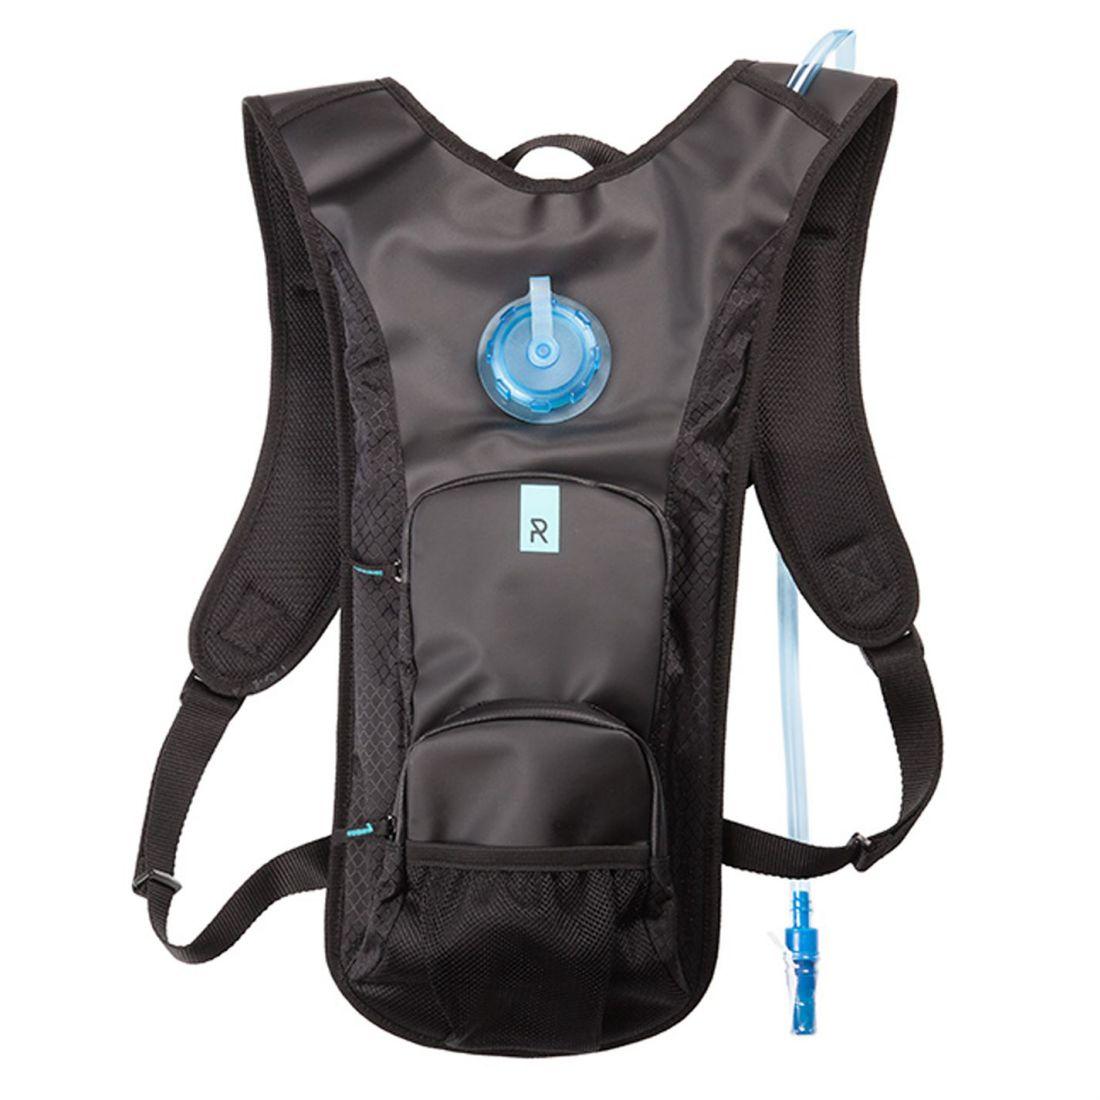 206d6a1c4e Radial Unisex Siege HydBag CL82 Hydration Bag 5057668938003 | eBay